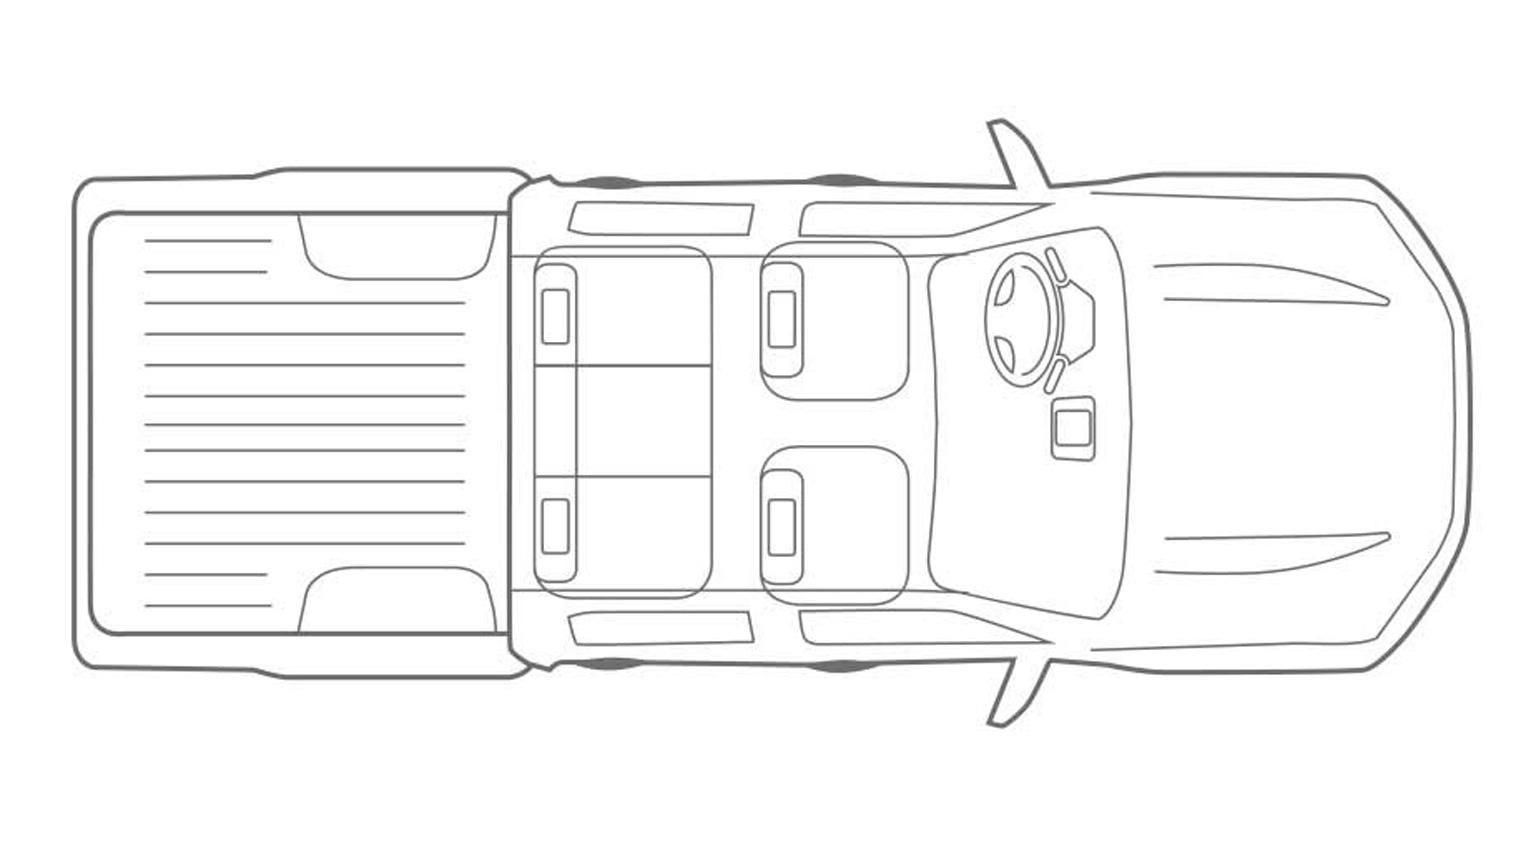 Nissan Navara Dimensions Bed